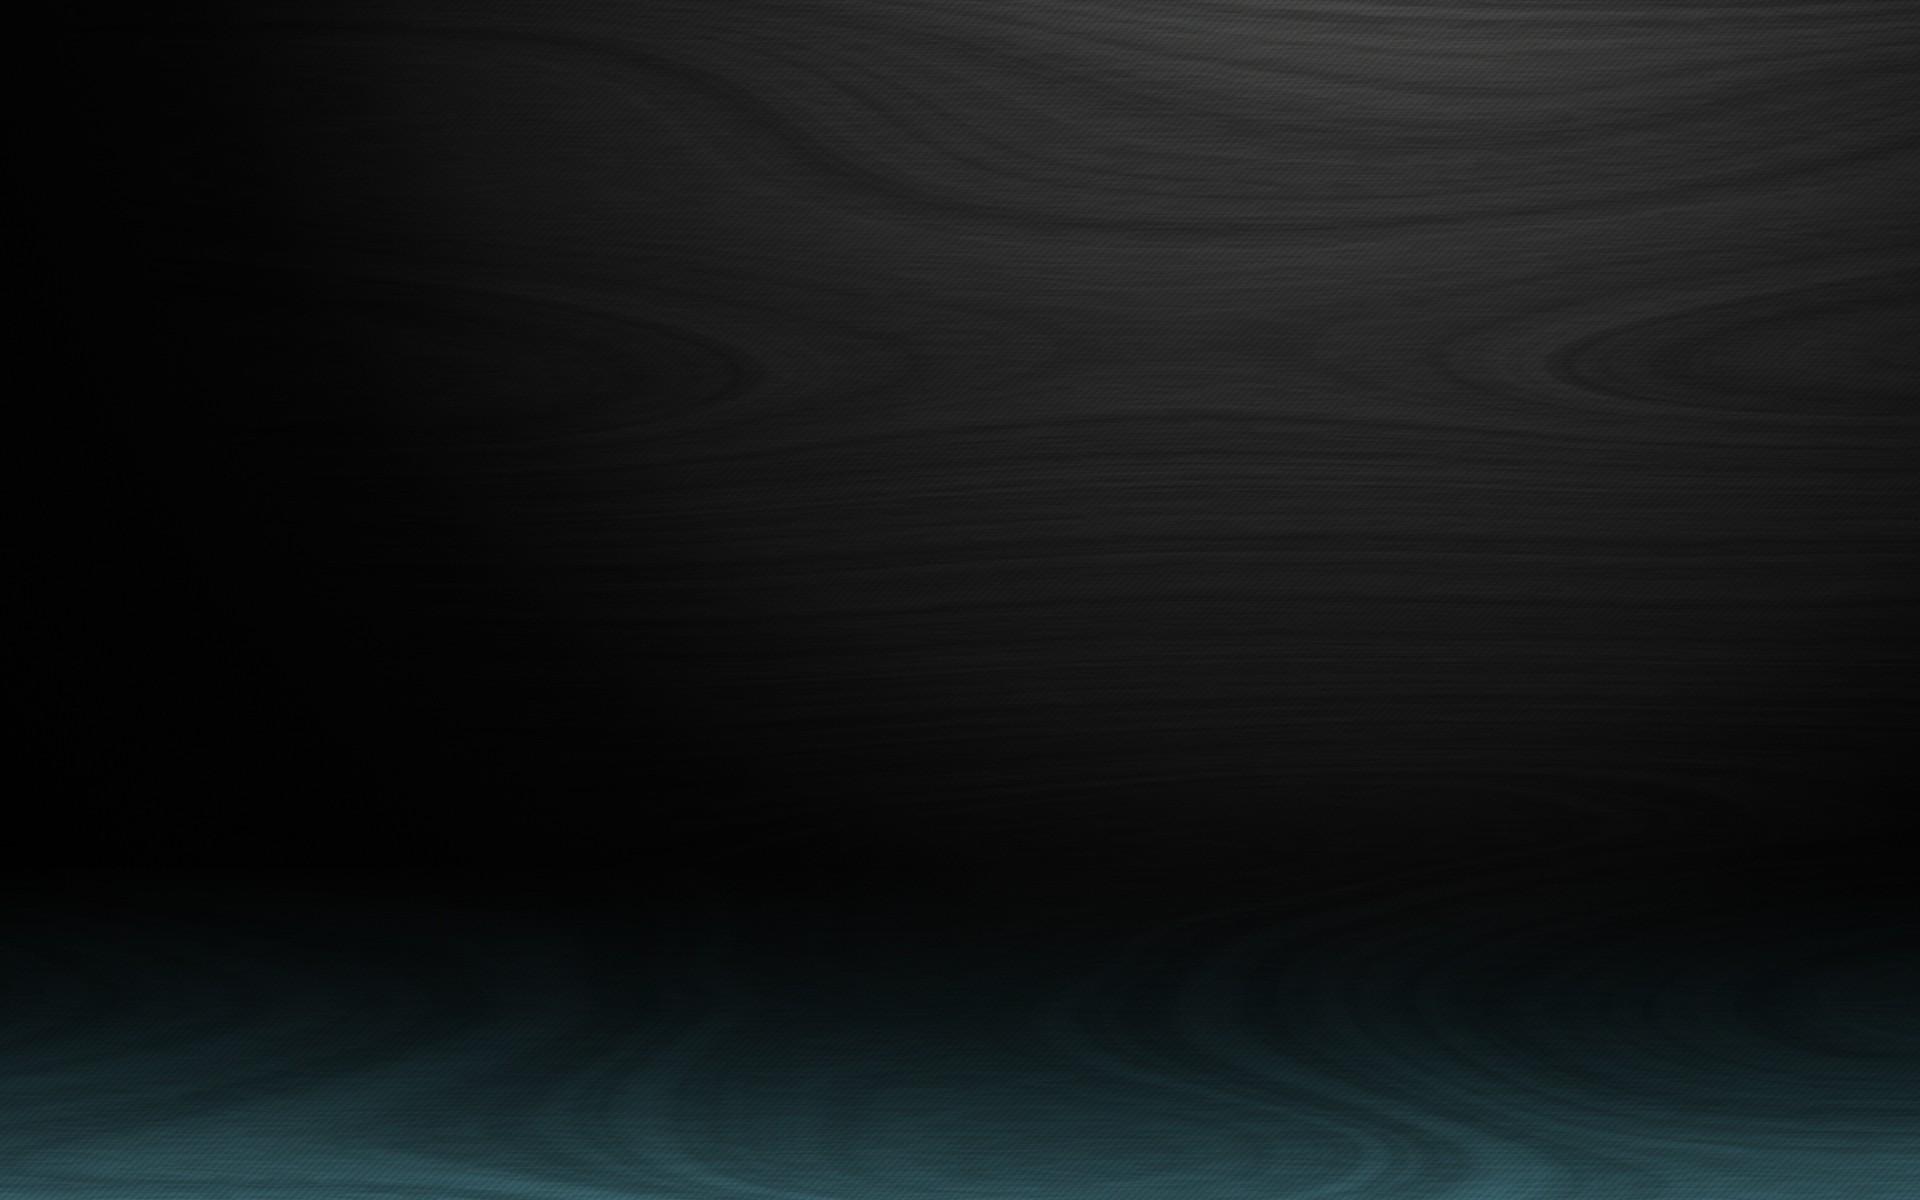 Free Download Black Texture Wallpaper Background Hd 1020 Hd Wallpaper Site 1920x1200 For Your Desktop Mobile Tablet Explore 73 Textured Hd Wallpapers Hd Texture Background Wallpaper Black Wallpaper Texture Texture Wallpaper Backgrounds